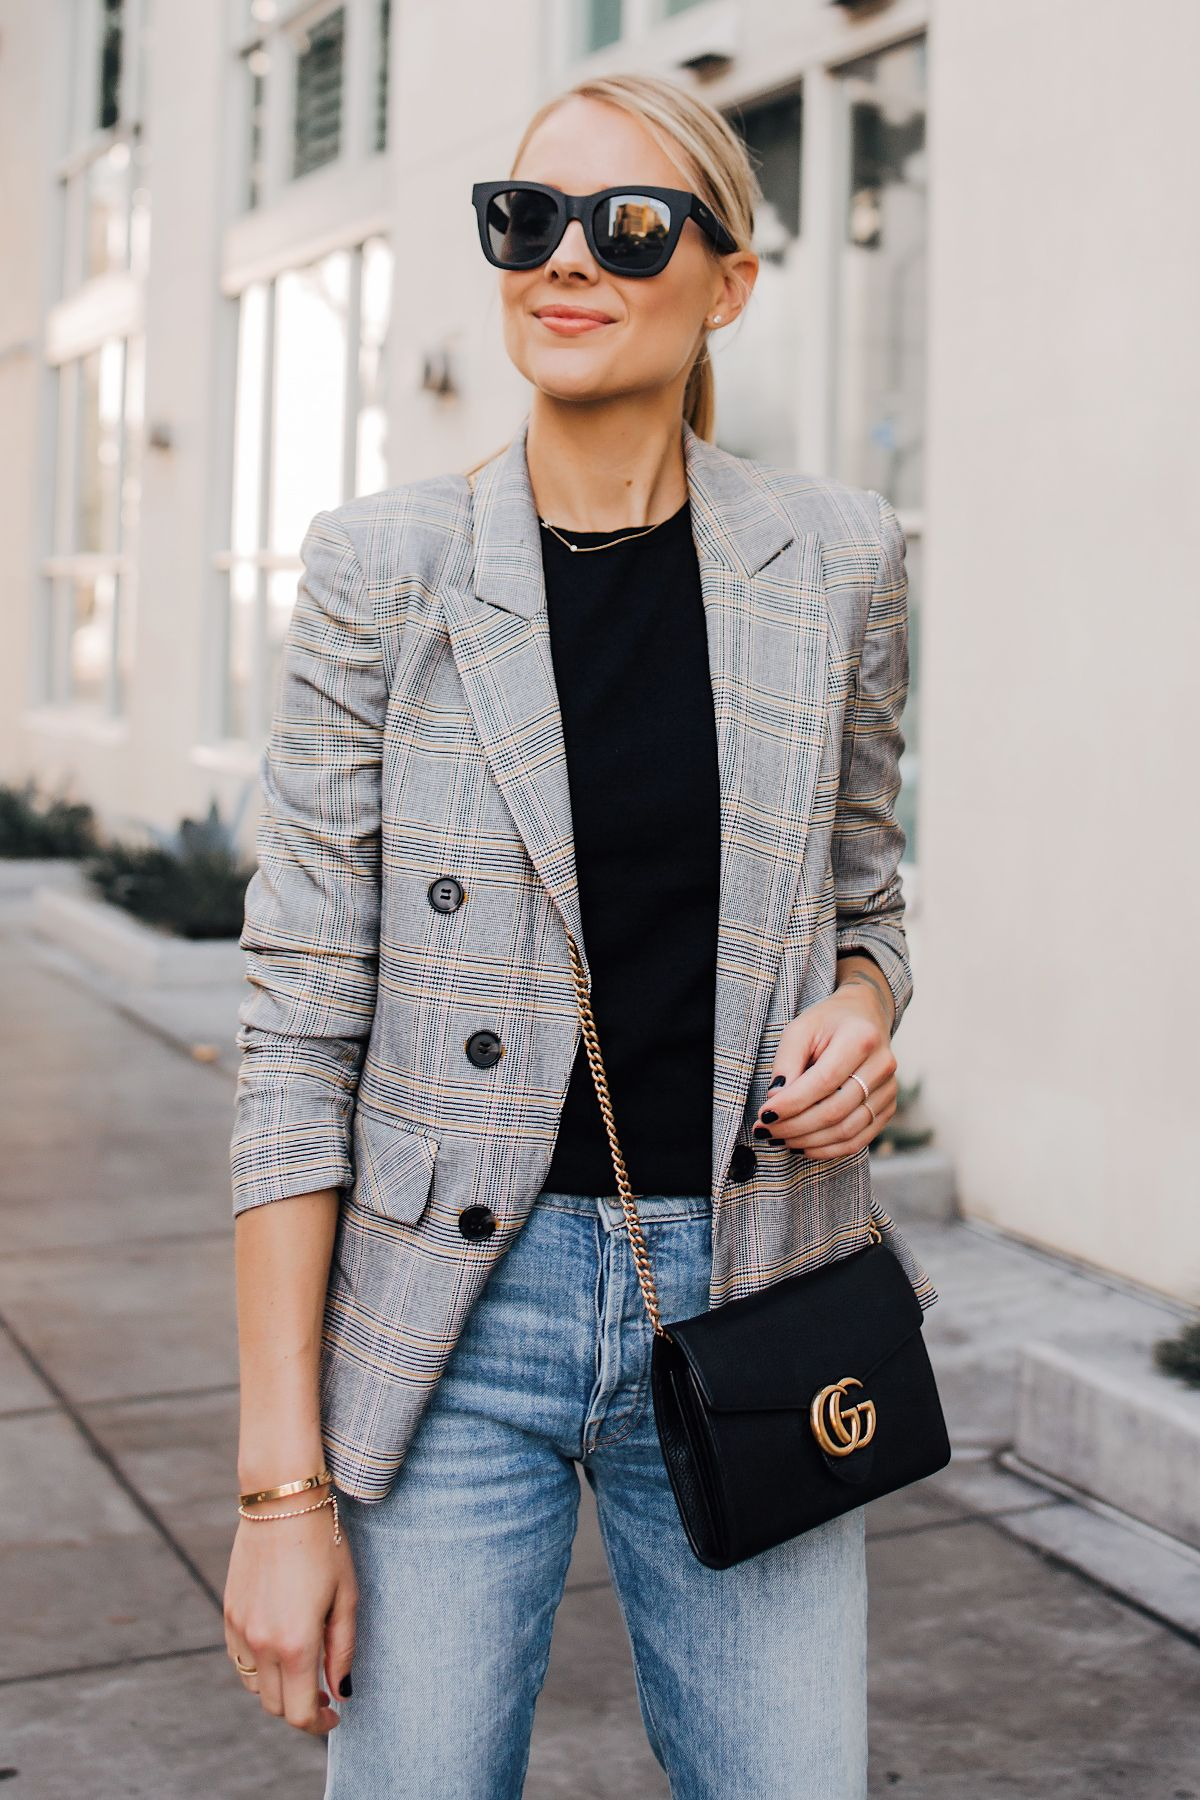 f193888142e2 Blonde Woman Wearing Plaid Blazer Outfit Jeans Gucci Black Handbag Fashion  Jackson San Diego Fashion Blogger Street Style